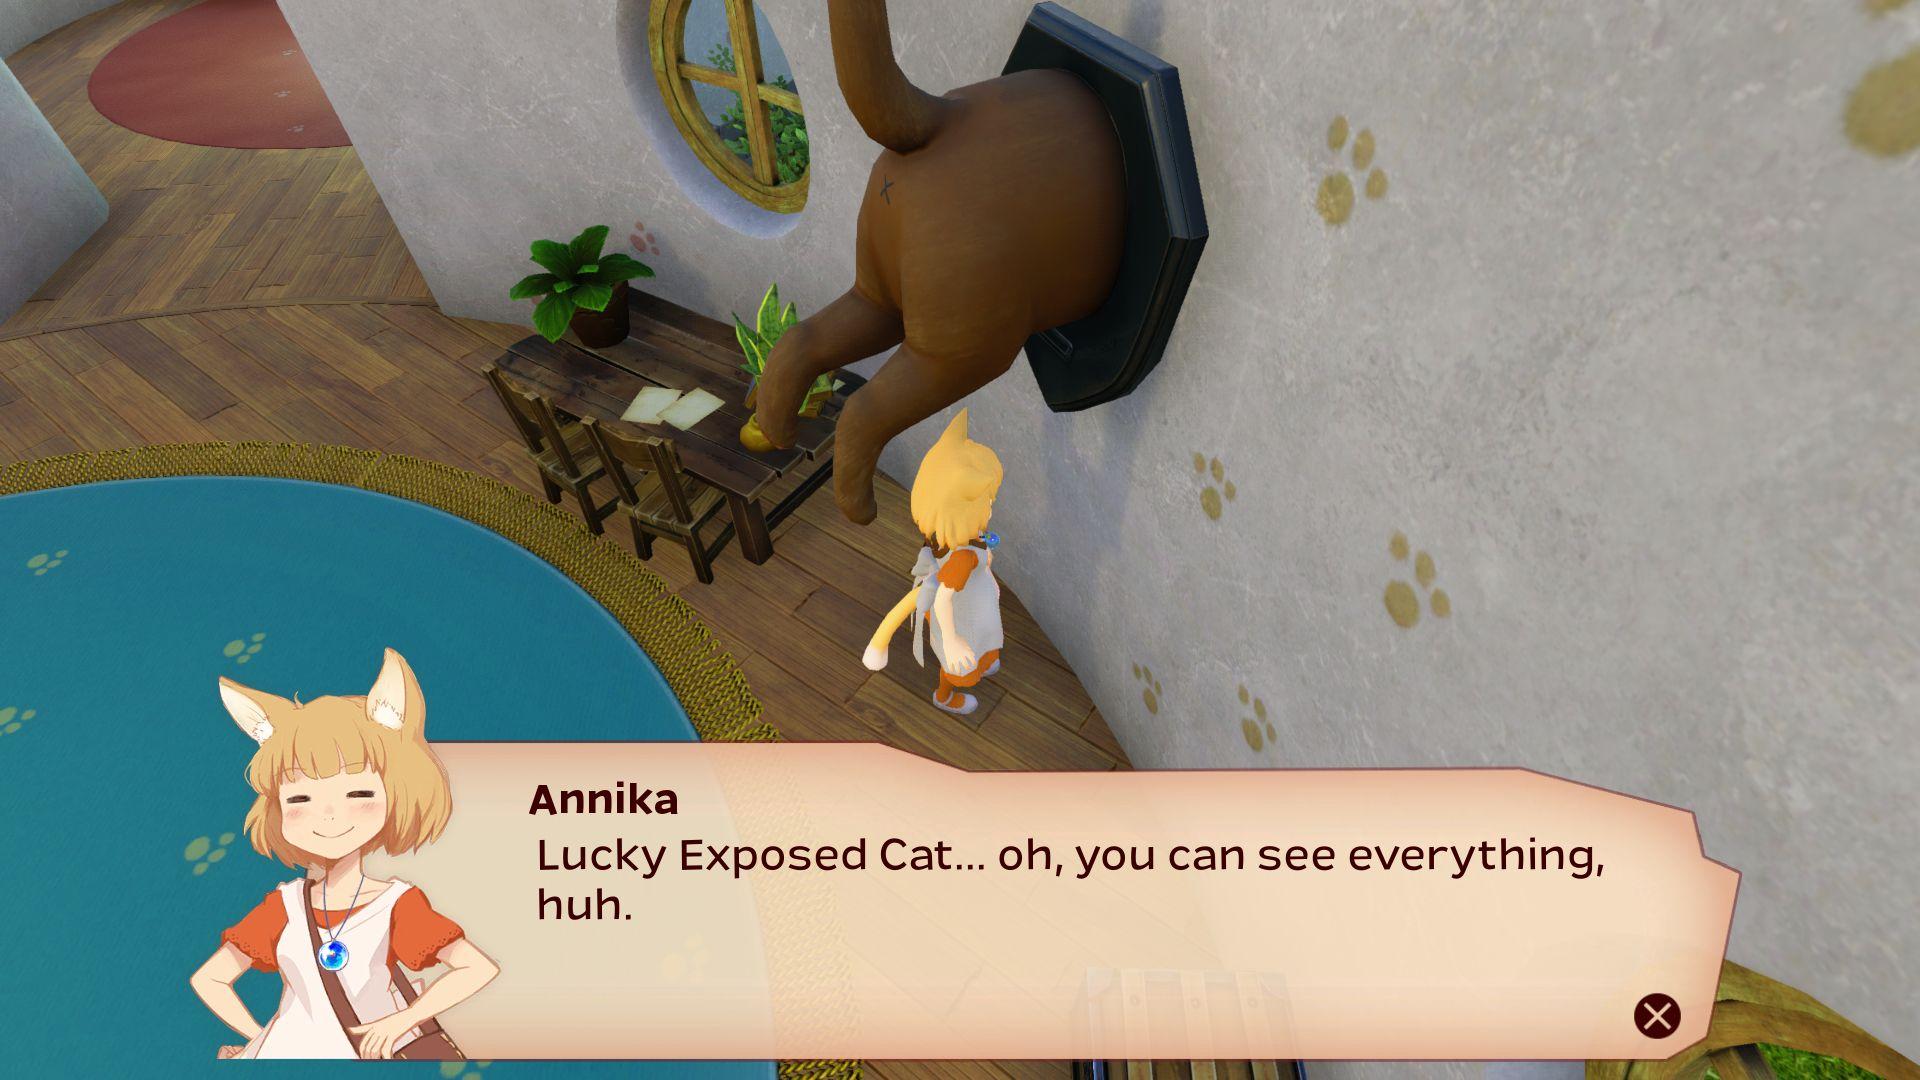 Giraffe and Annika 2